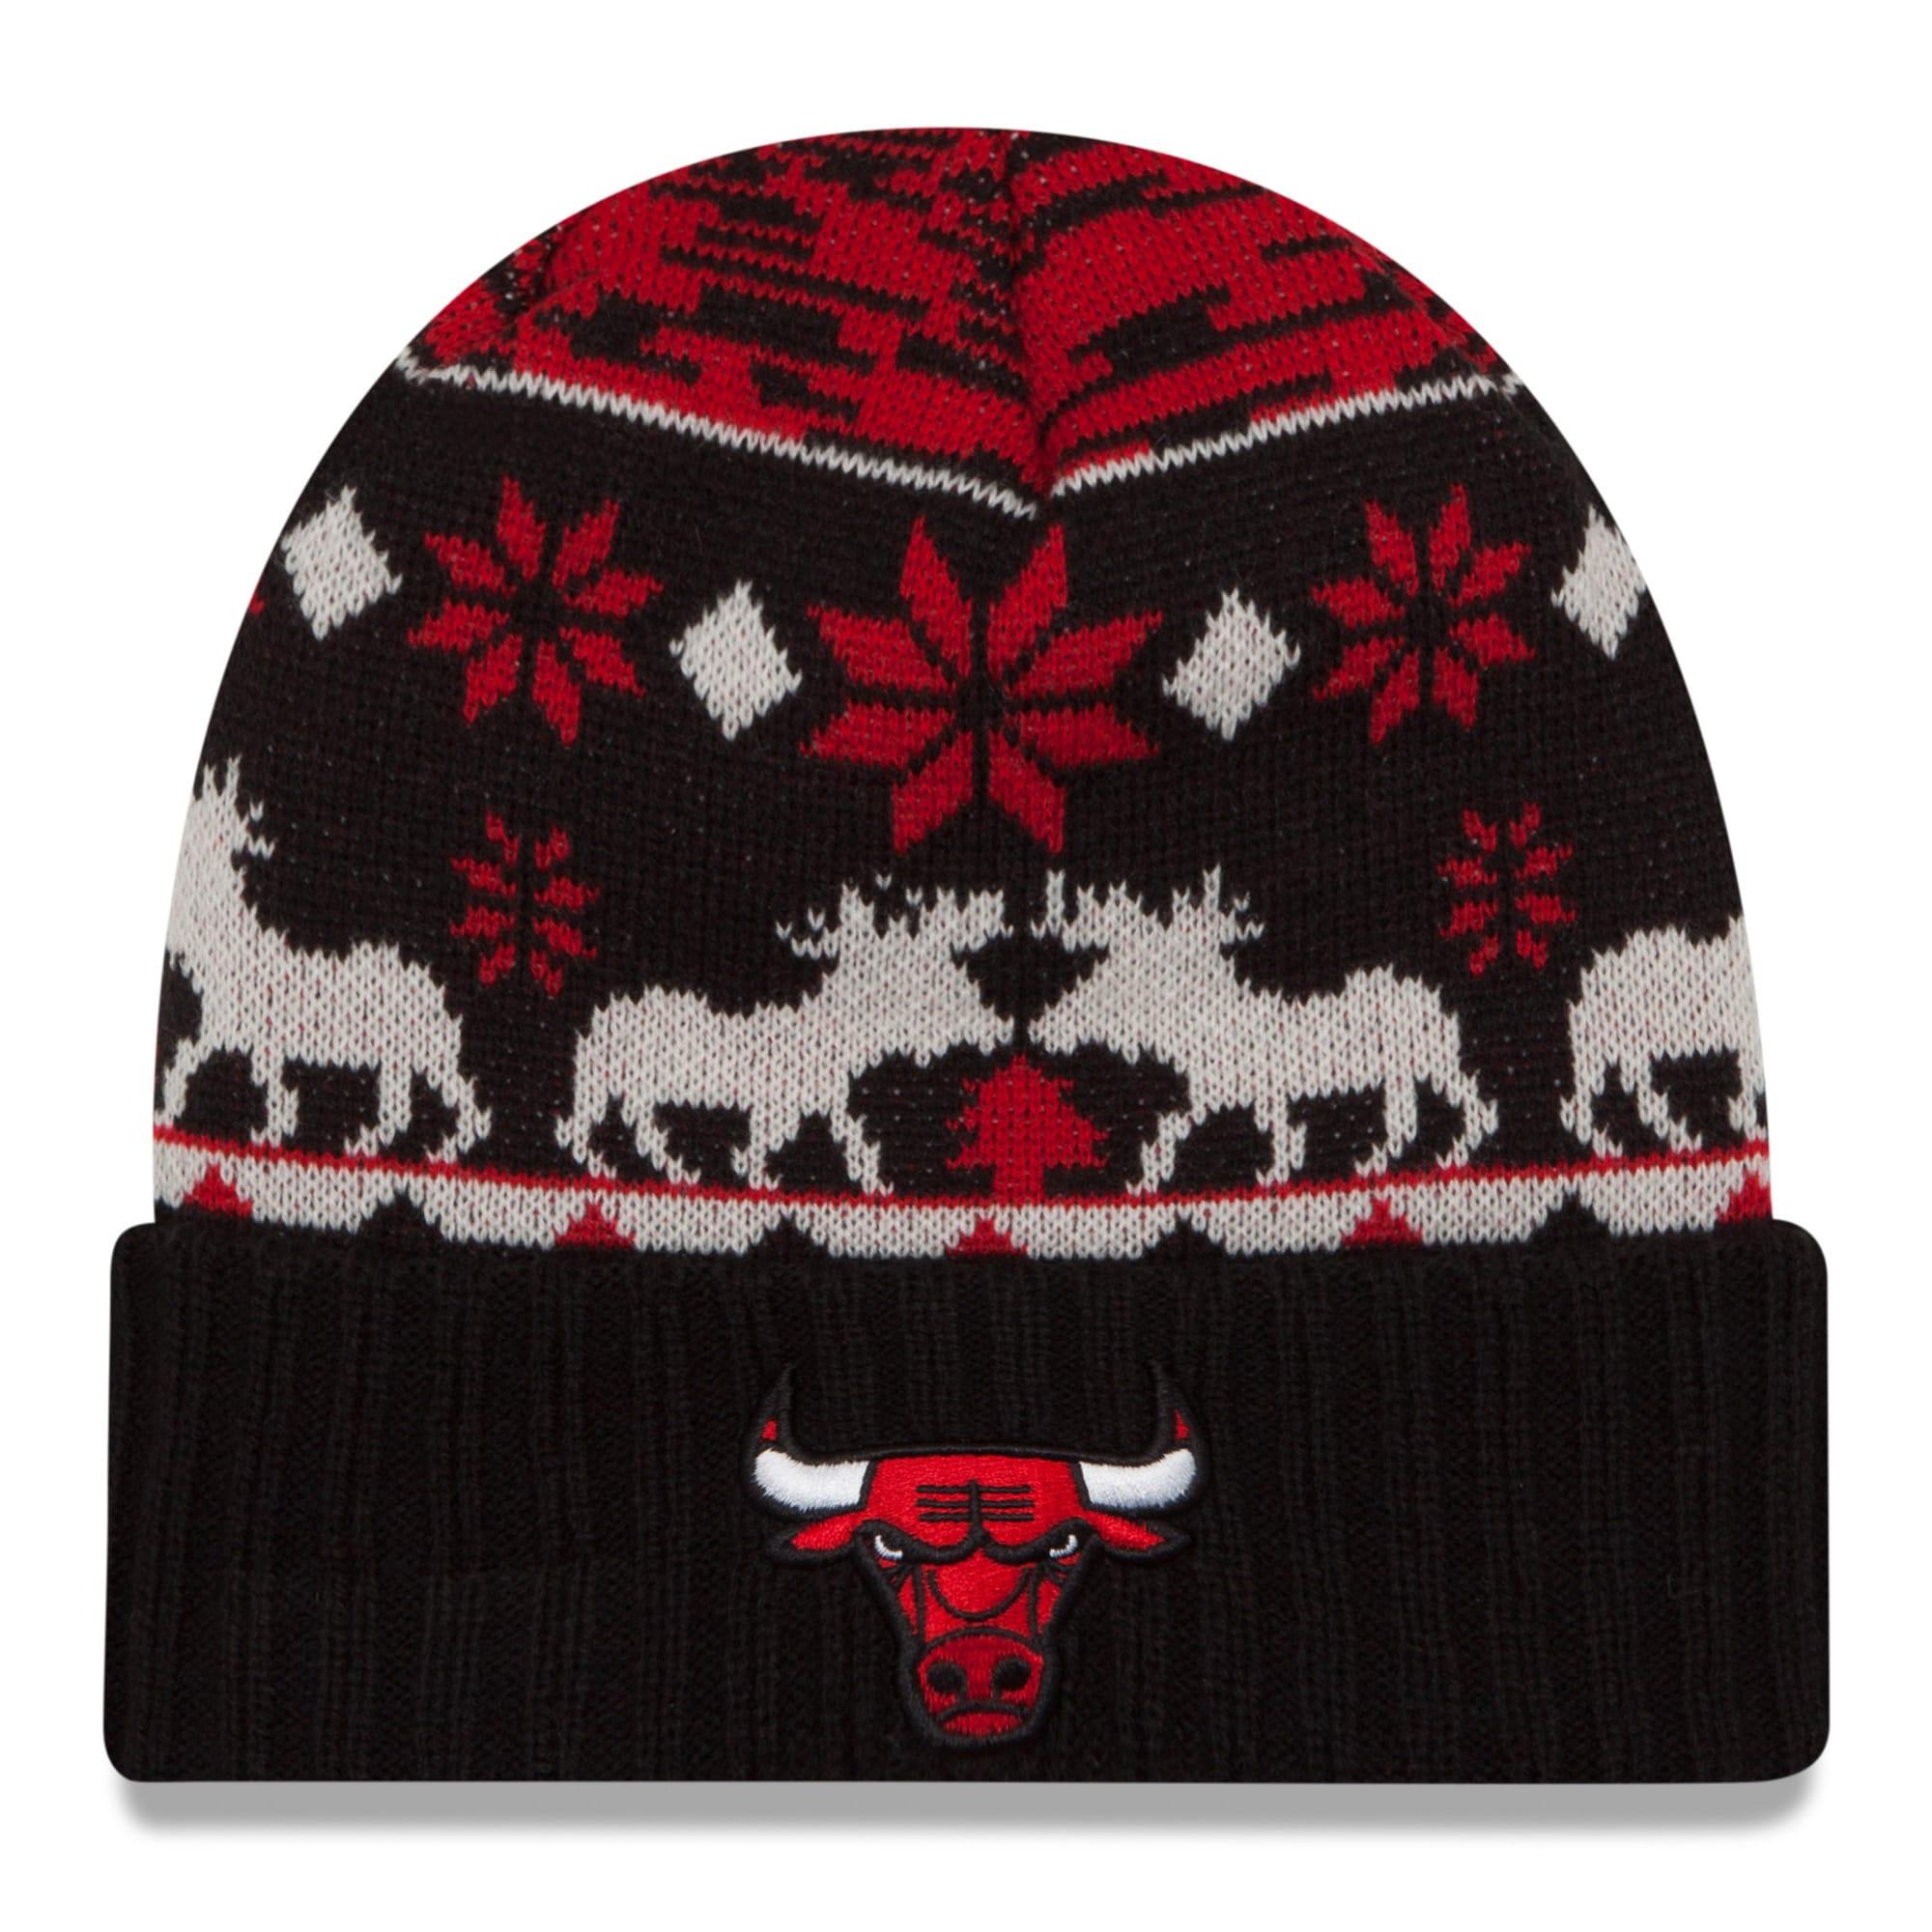 Chicago Bulls New Era NBA Mosser Cuffed Knit Hat - Red